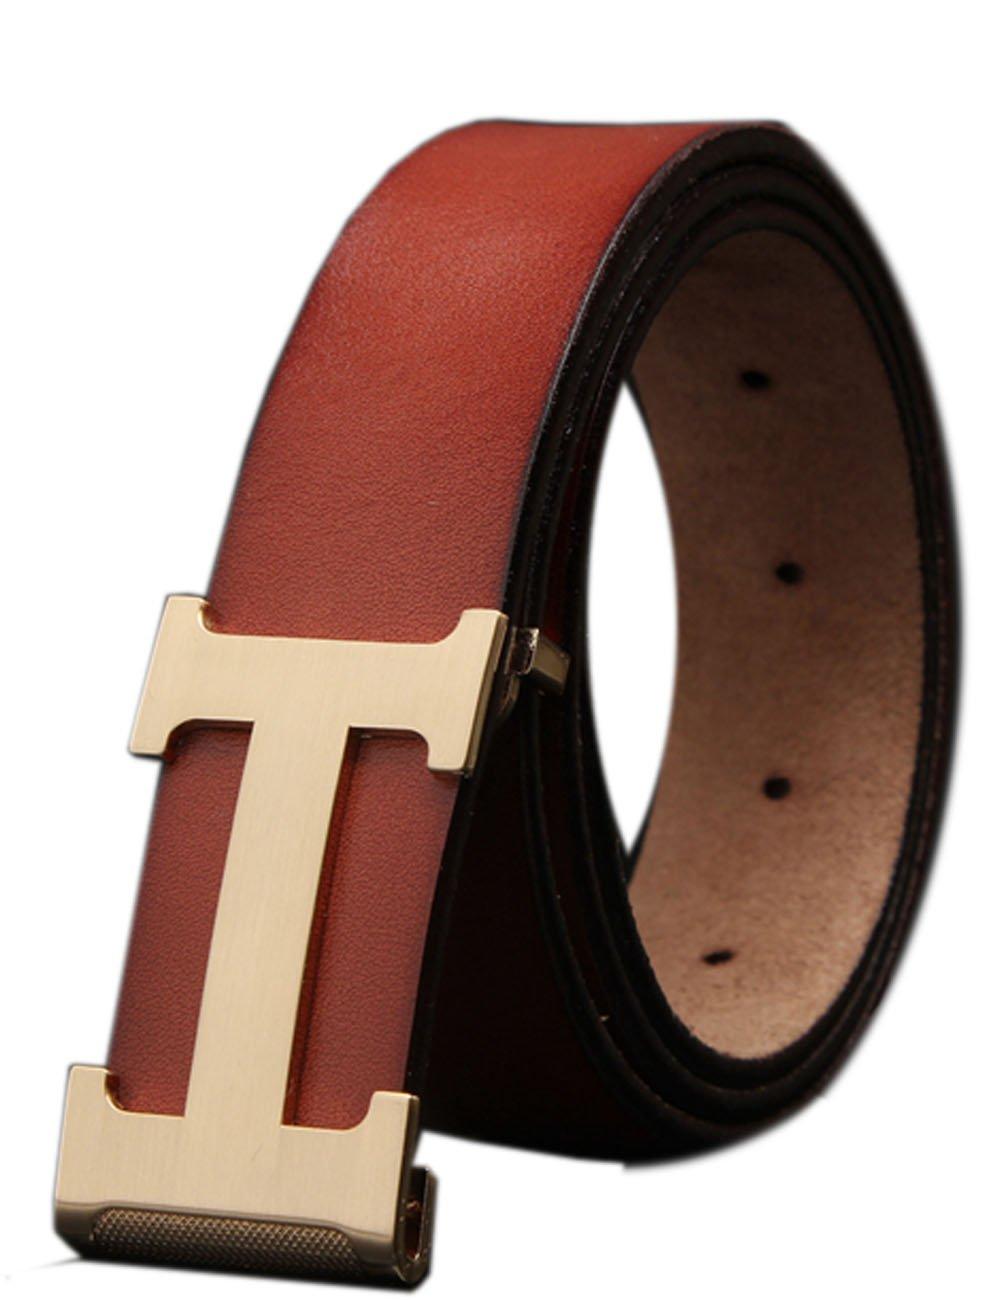 Menschwear Men's Geniune Leather Belt Slide Metal Buckle Adjustable Waistband 35MM Coffee125cm